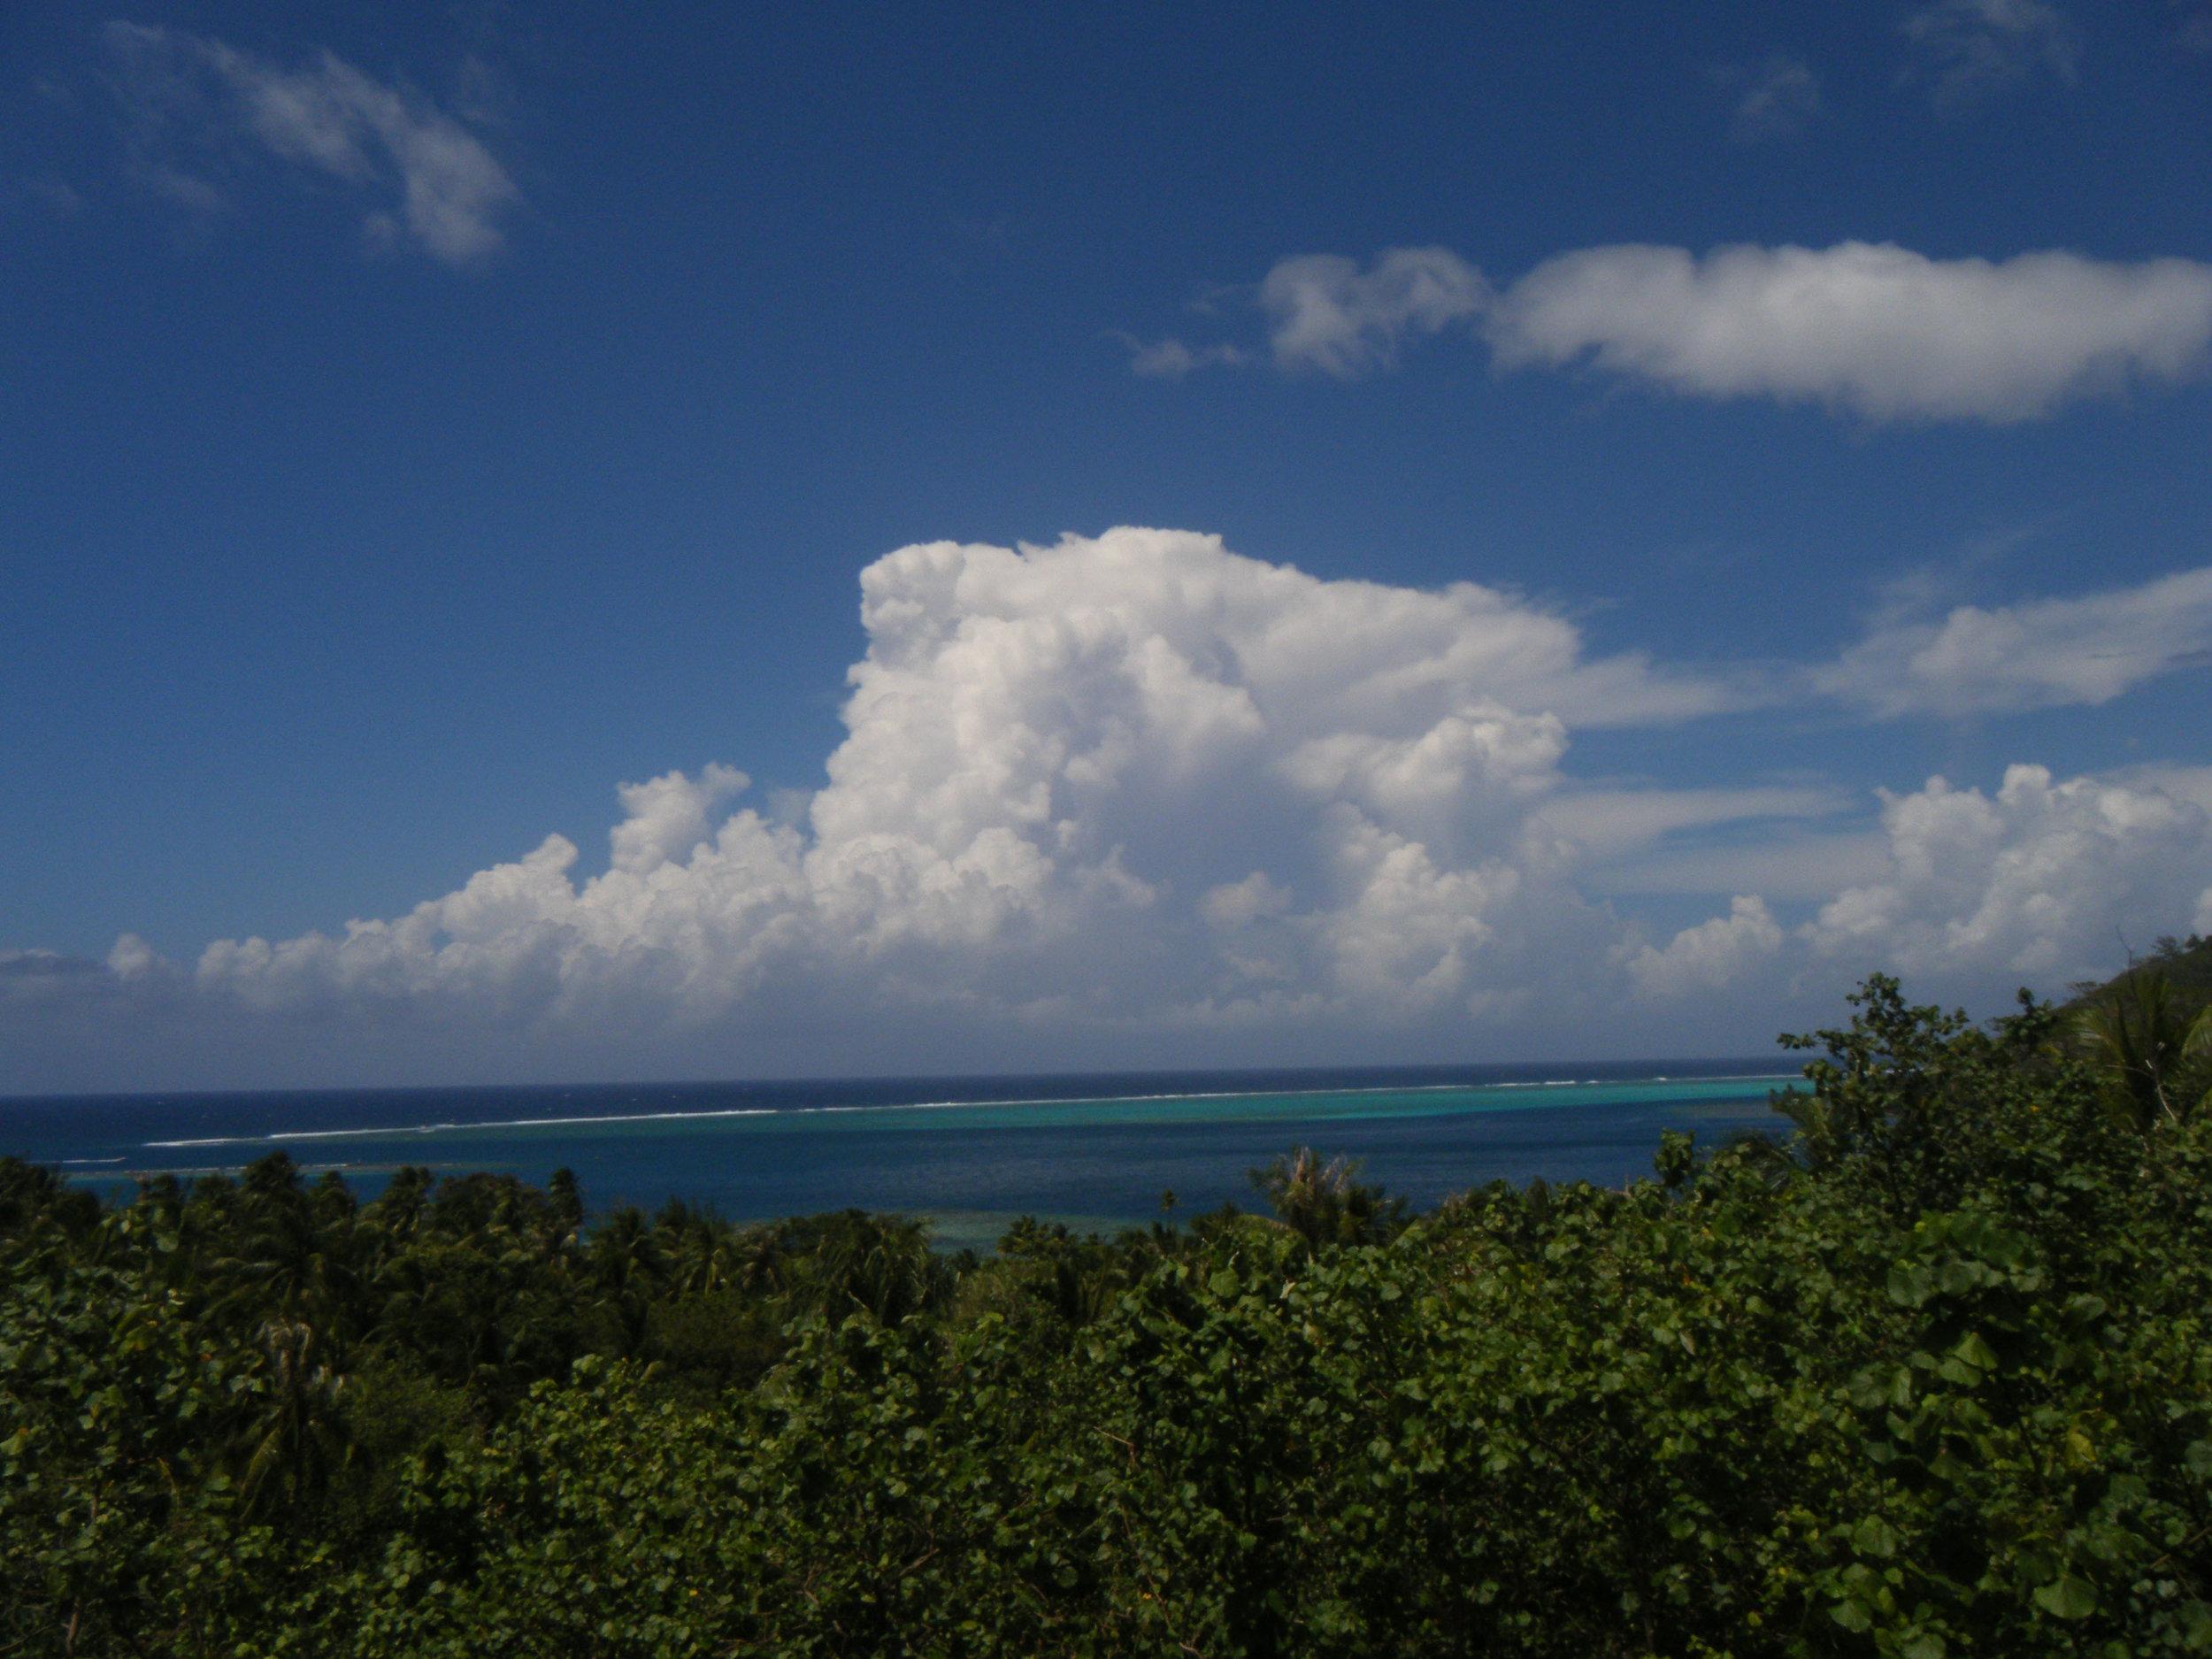 GML bungalow vista.jpg